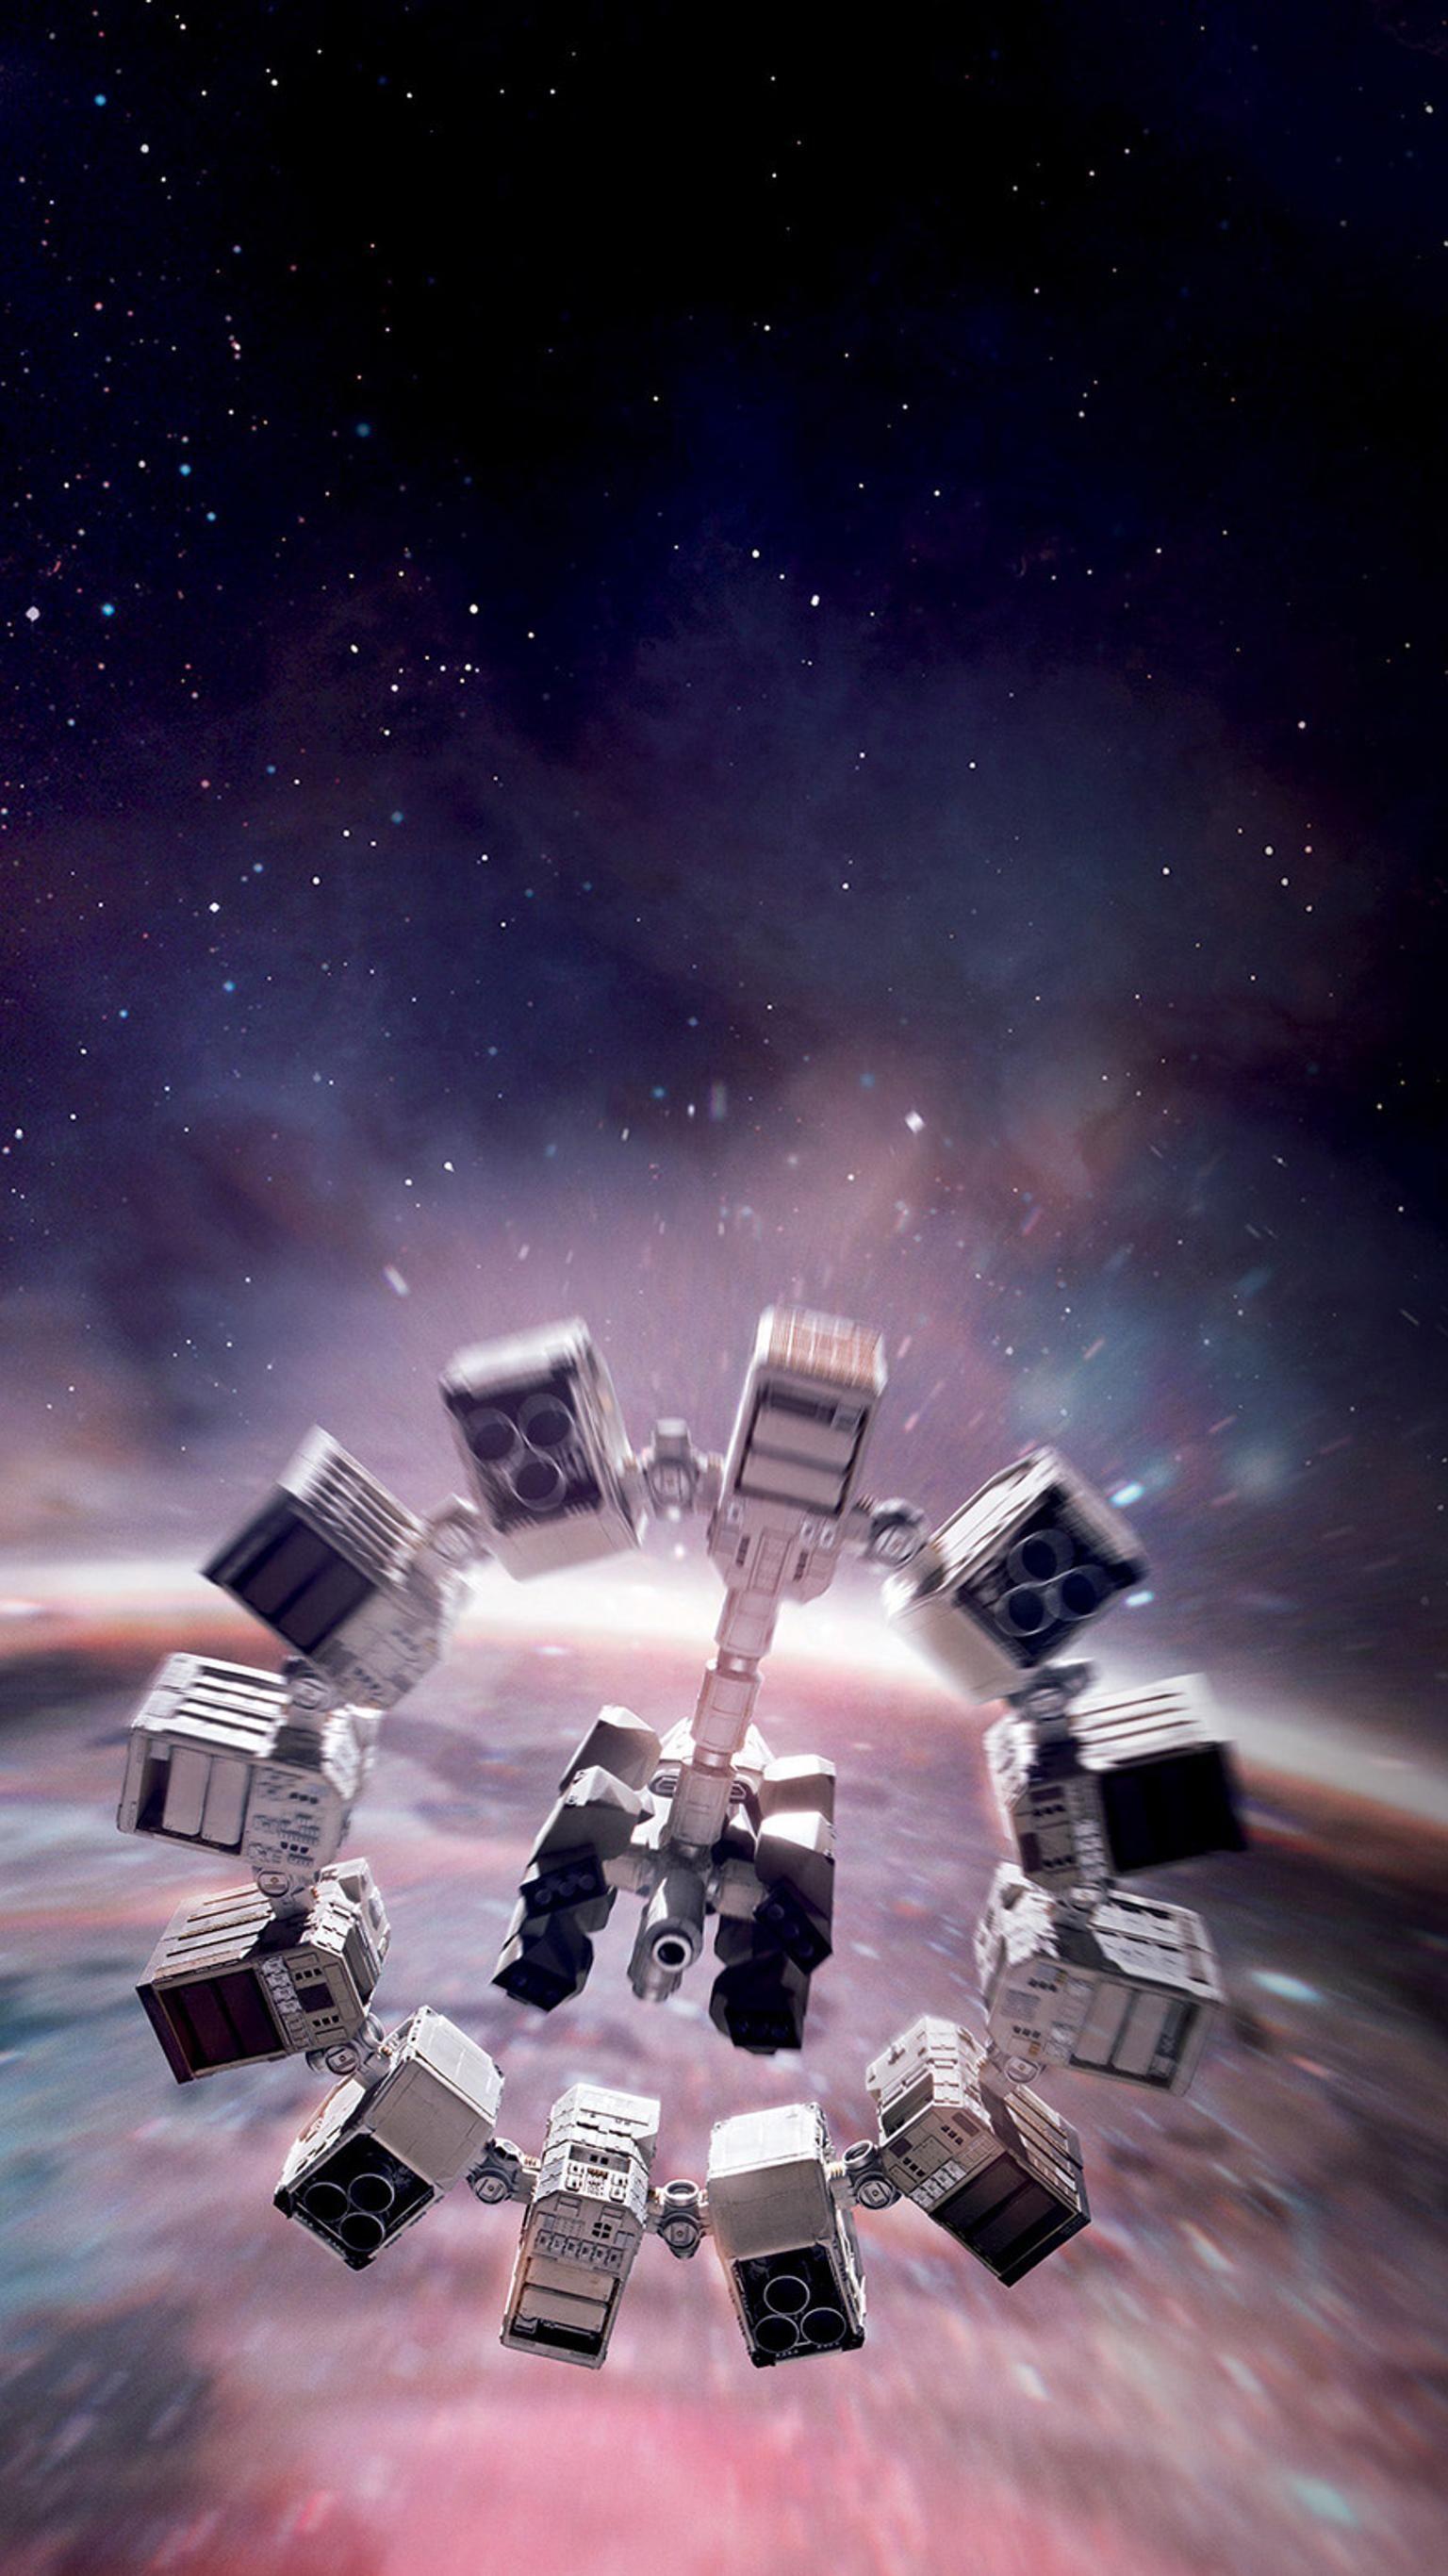 Interstellar 2014 Phone Wallpaper Moviemania Interstellar Phone Wallpaper Interstellar Movie